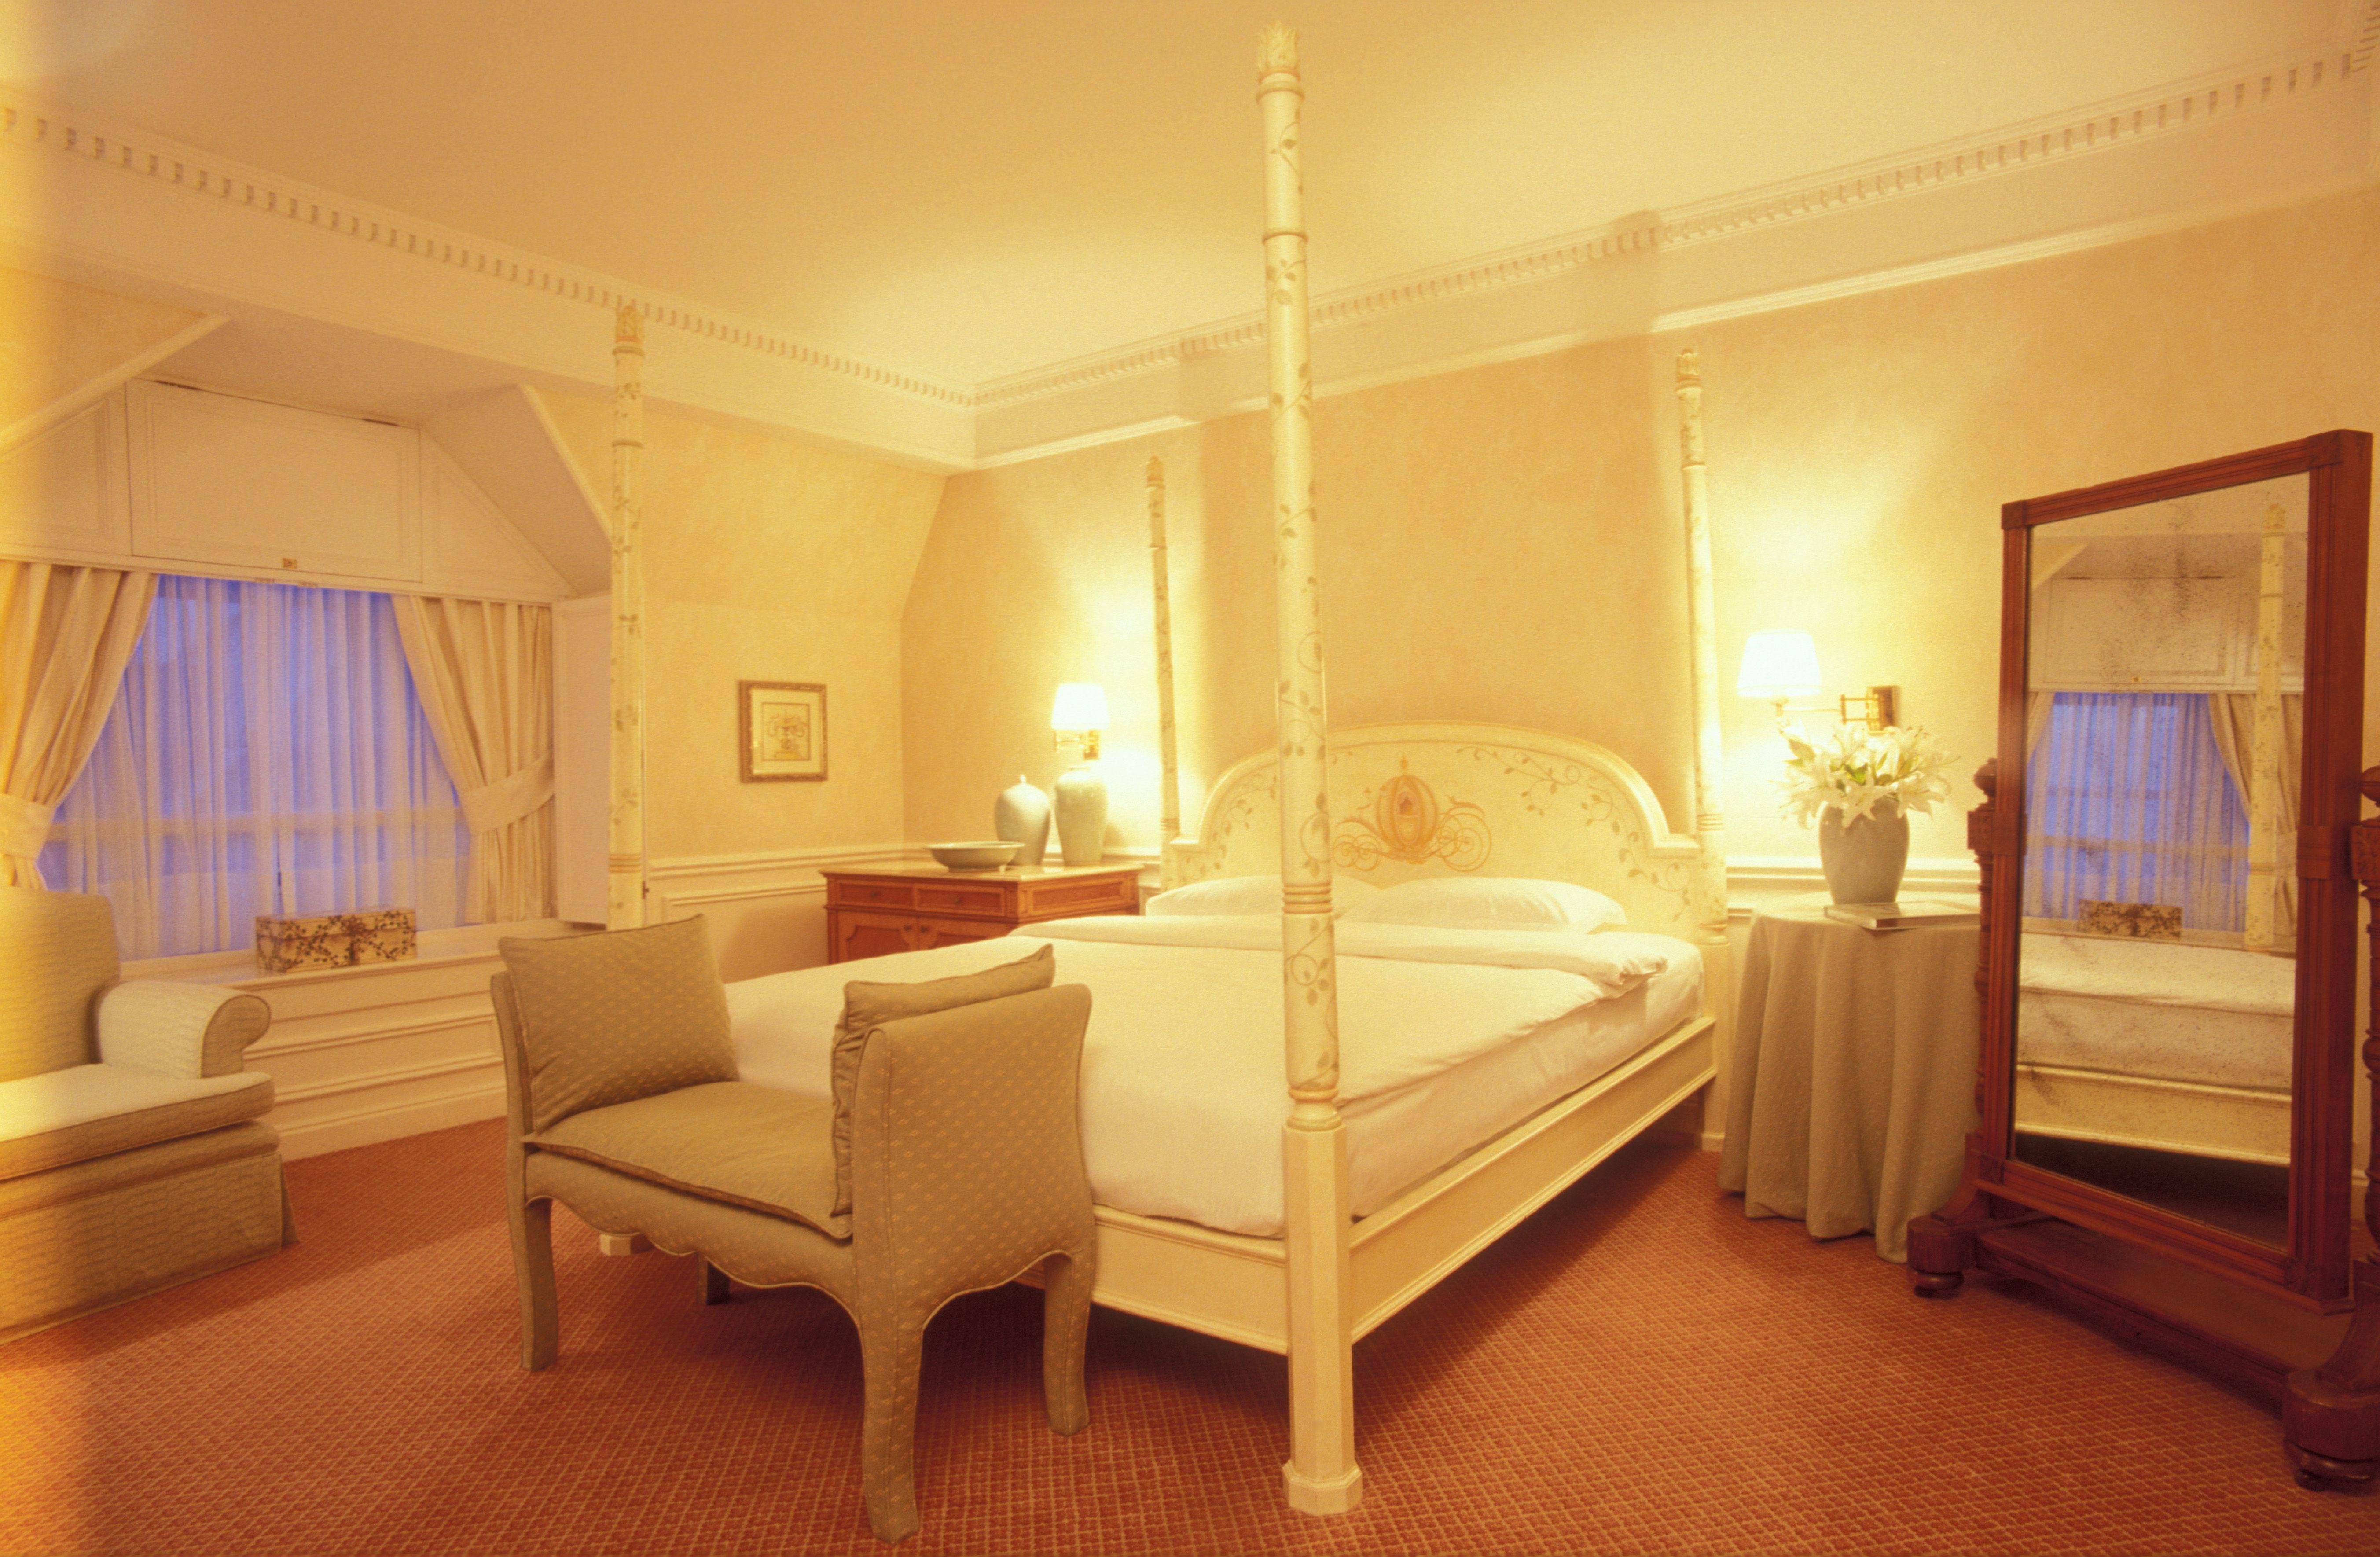 Disney Hotels Disneyland Hotel Castle Club Room Disneyland Paris